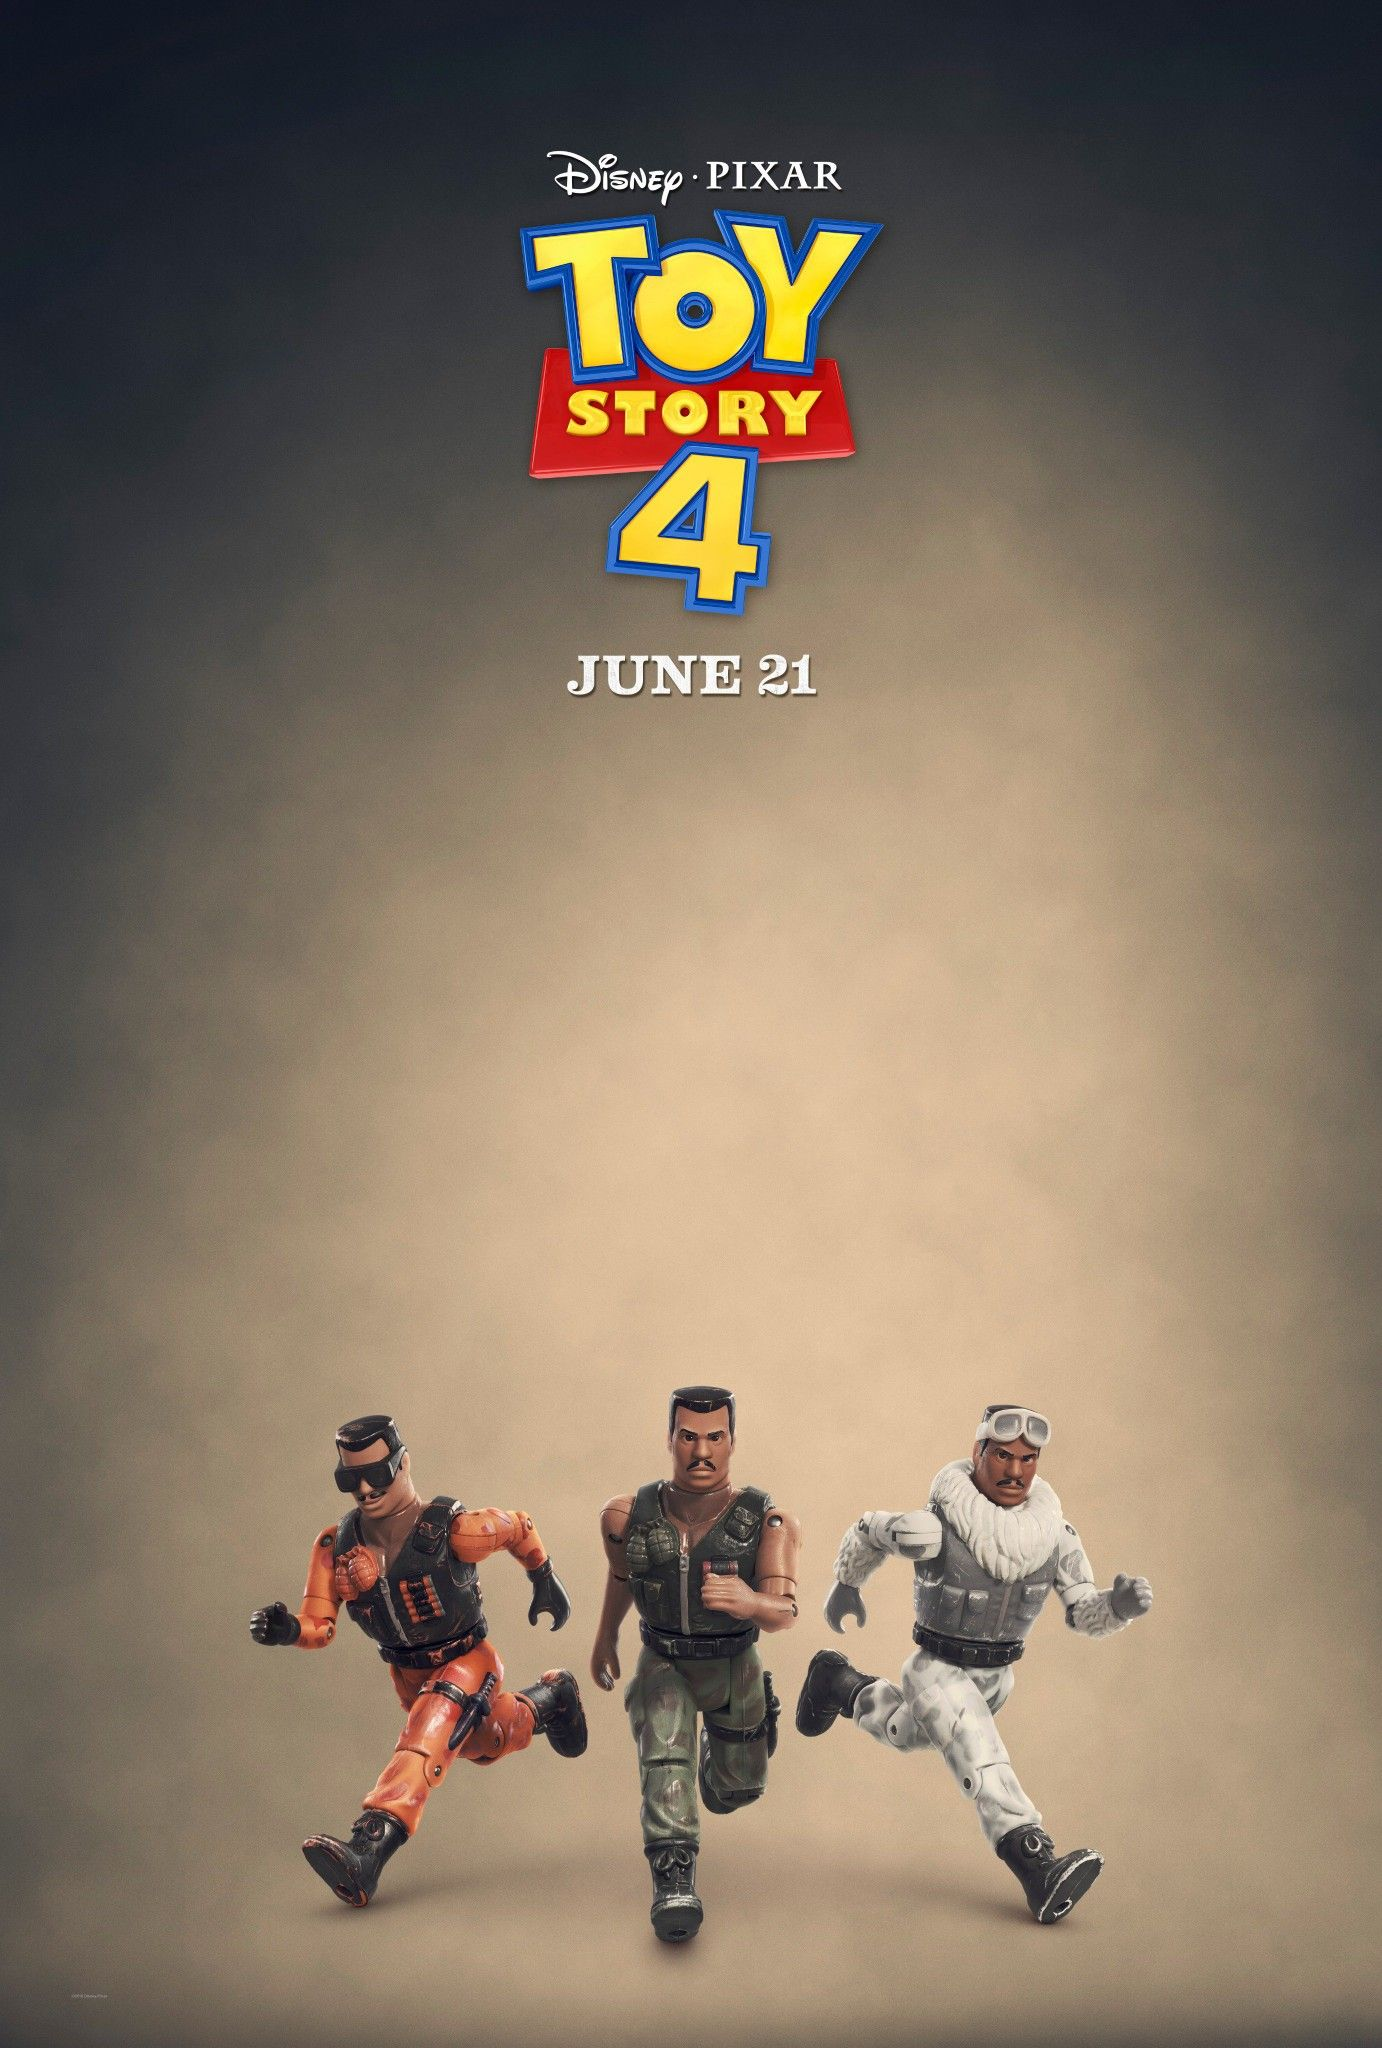 Toy Story 4 New Toy Story Toy Story Toy Story Movie